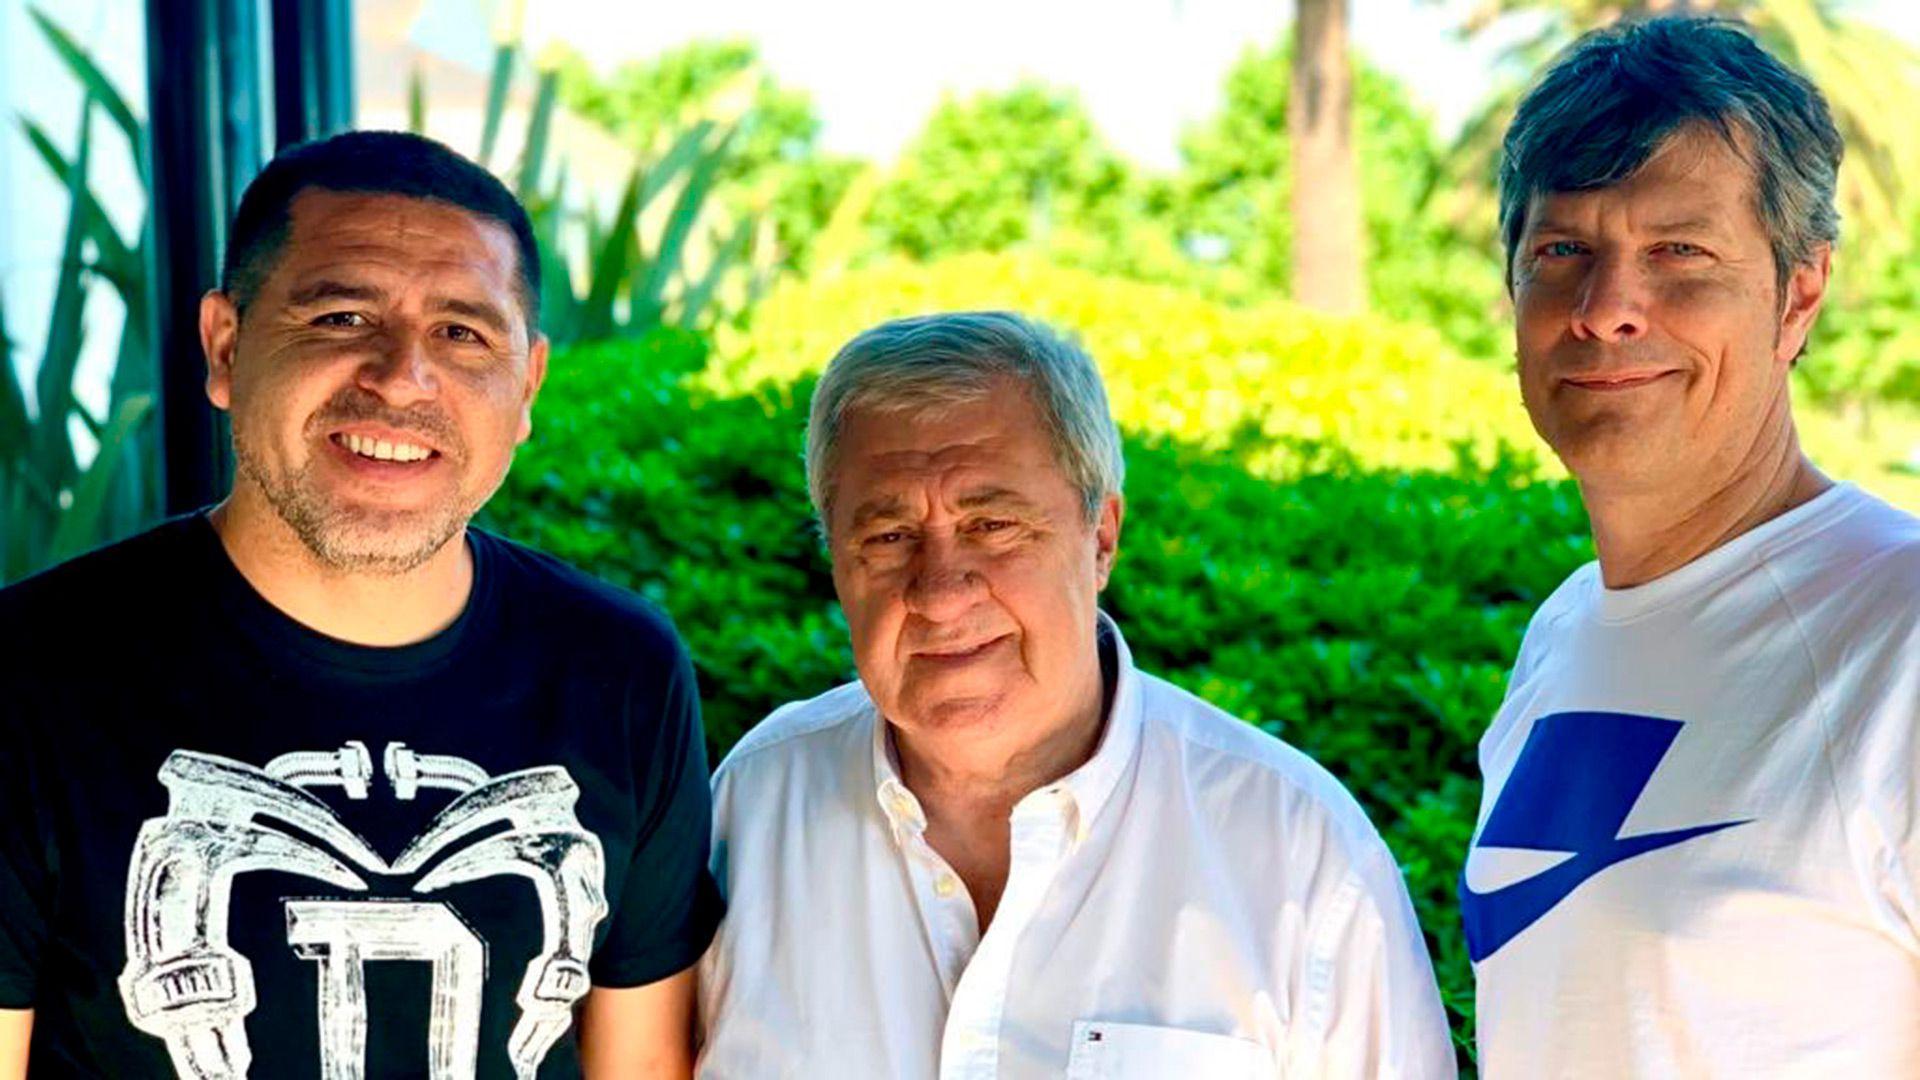 Román Riquelme, Jorge Ameal y Mario Pergolini.